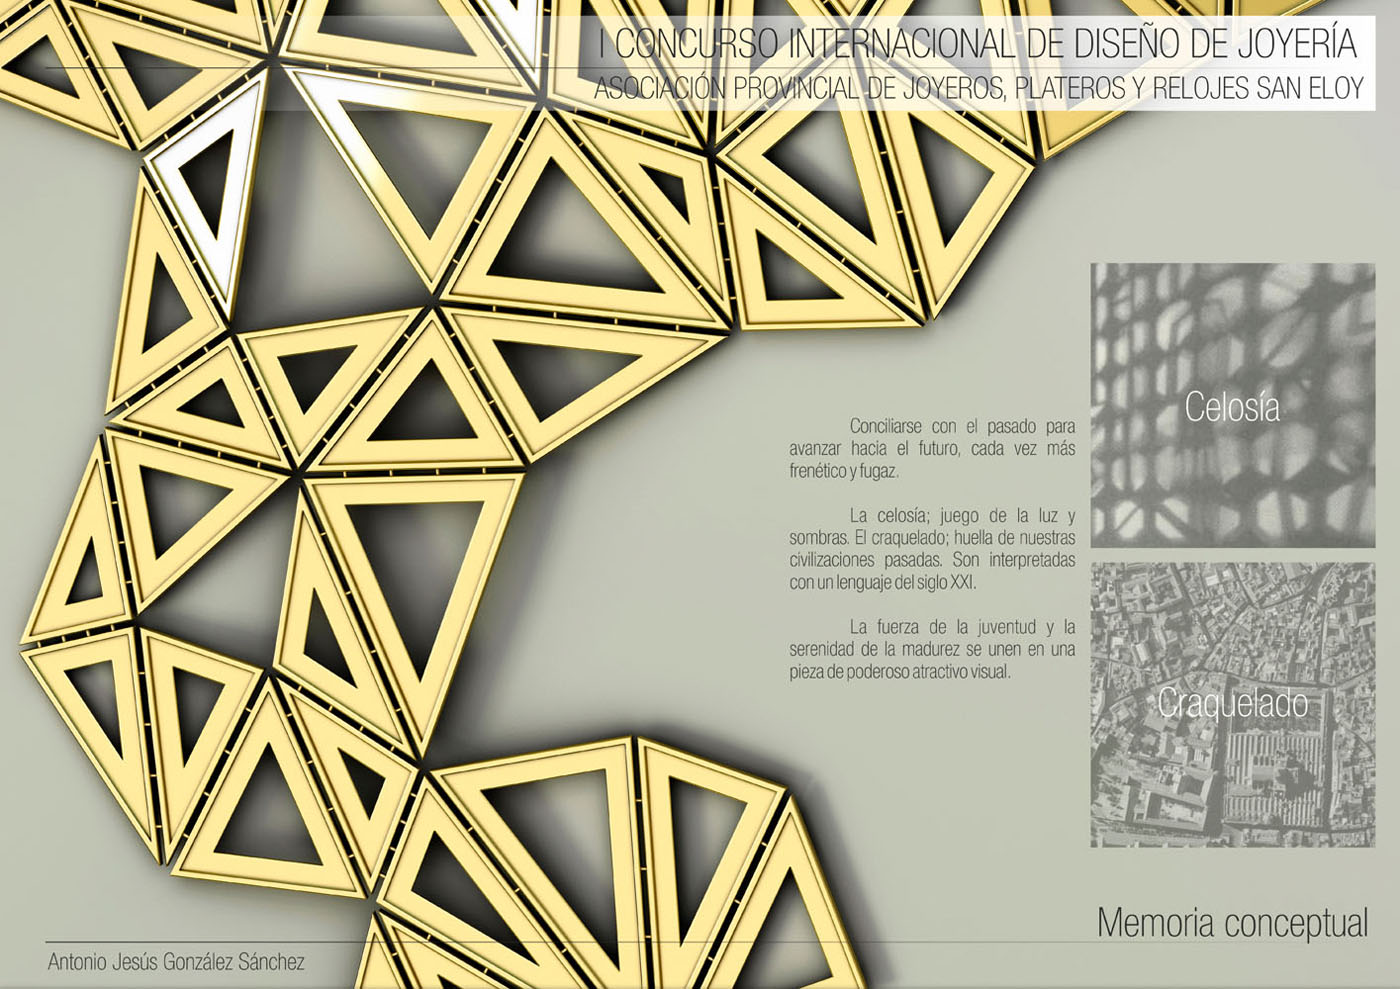 Dise o de joyer a arquitectura y dise o for Blog arquitectura y diseno